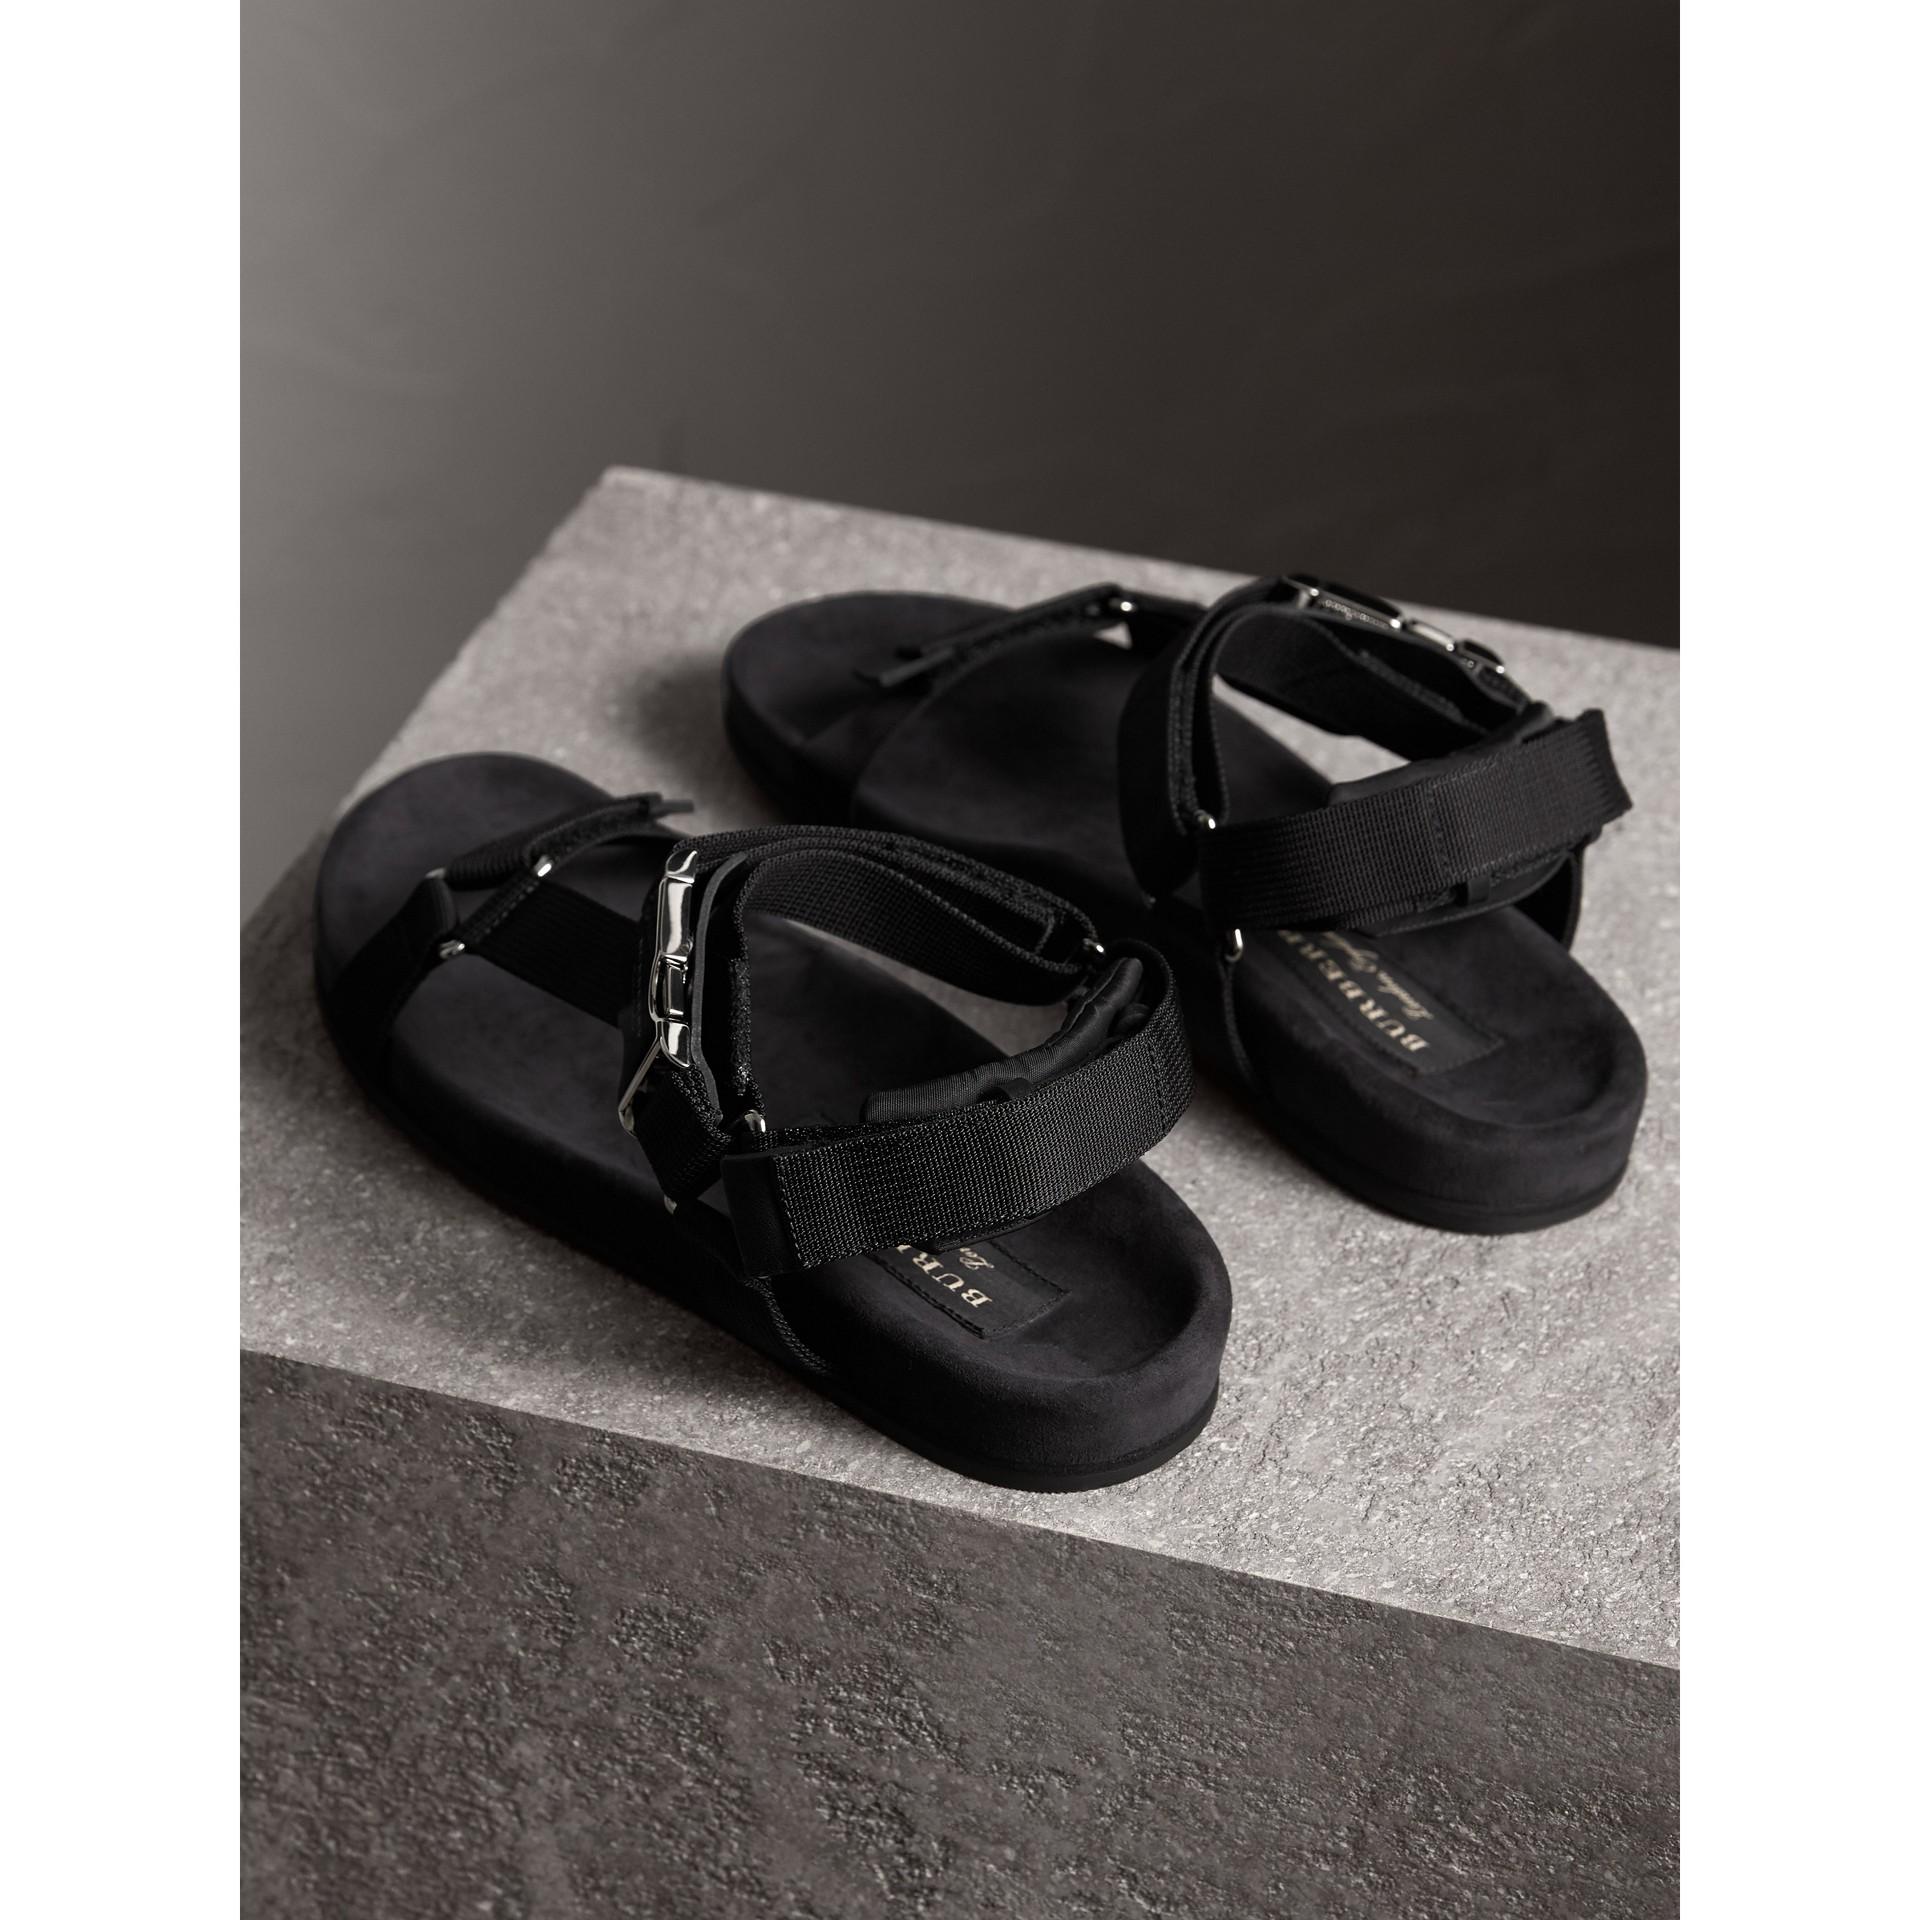 Three-point Strap Ripstop Sandals in Black - Men | Burberry Australia - gallery image 4